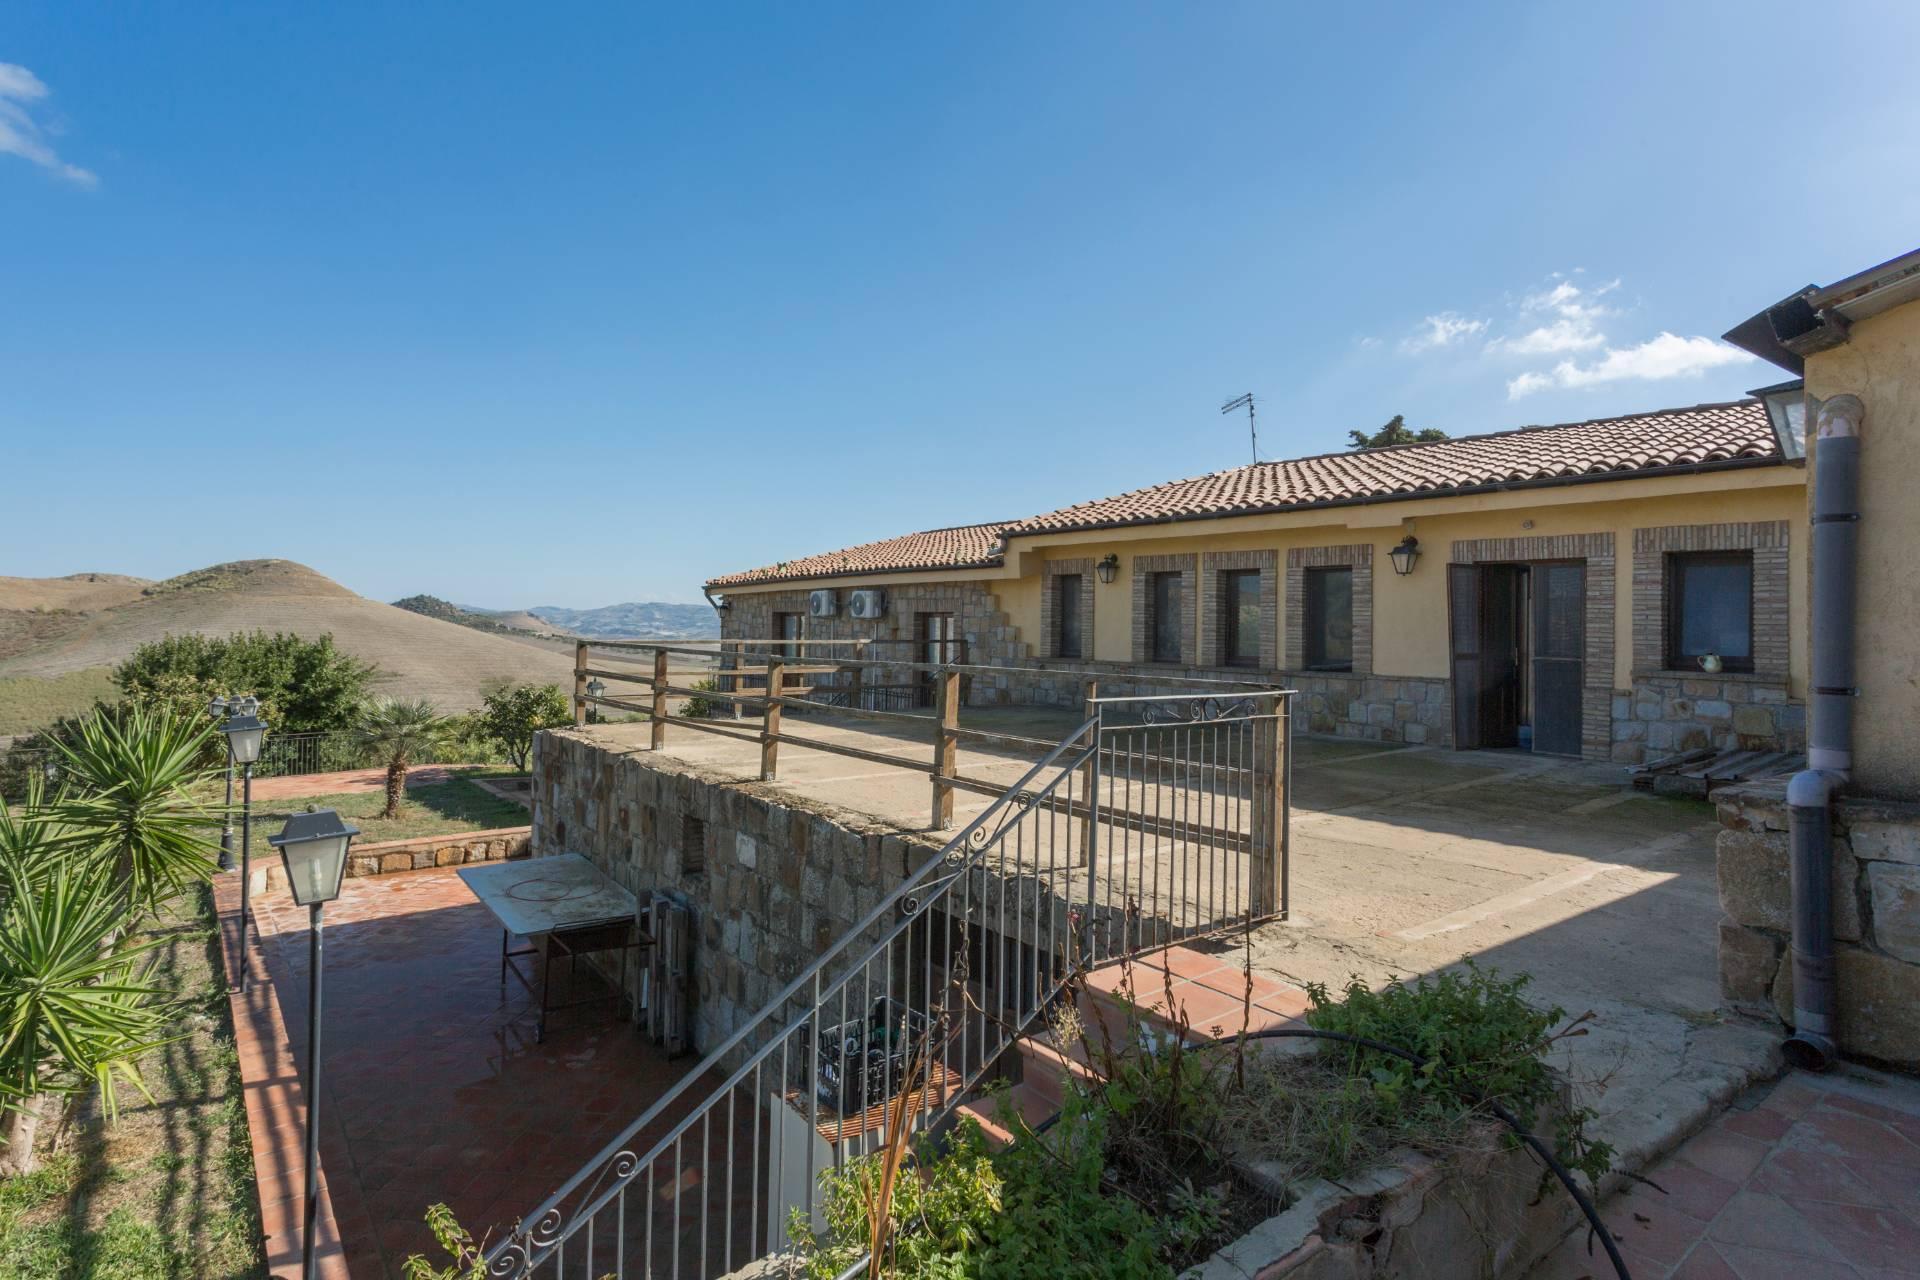 Farmhouse in the heart of Sicily - 4